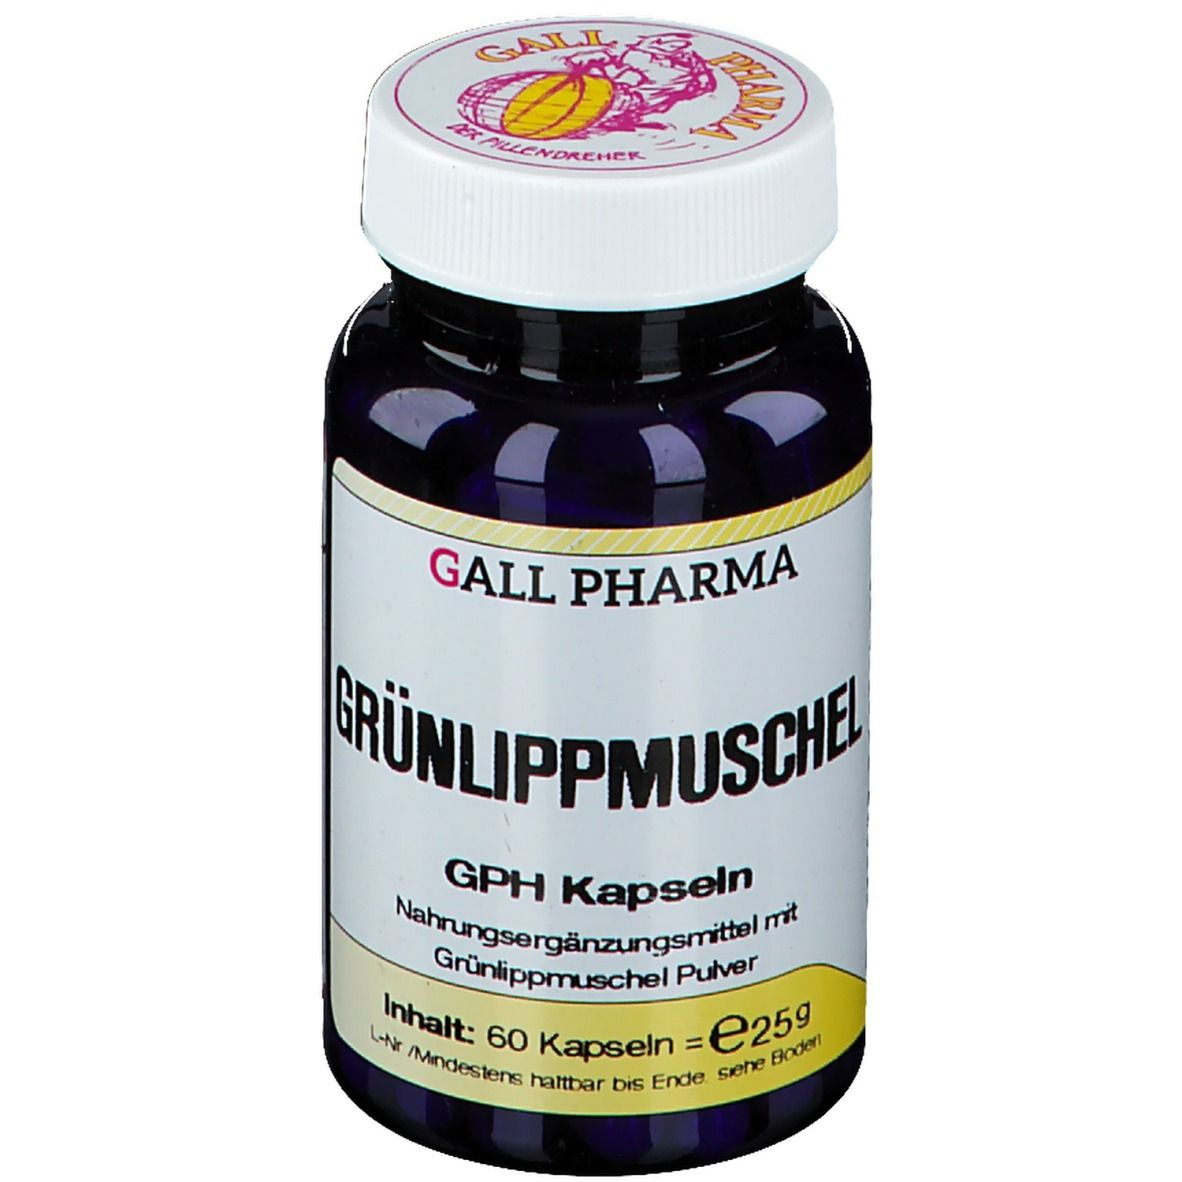 GALL PHARMA Grünlippmuschel GPH